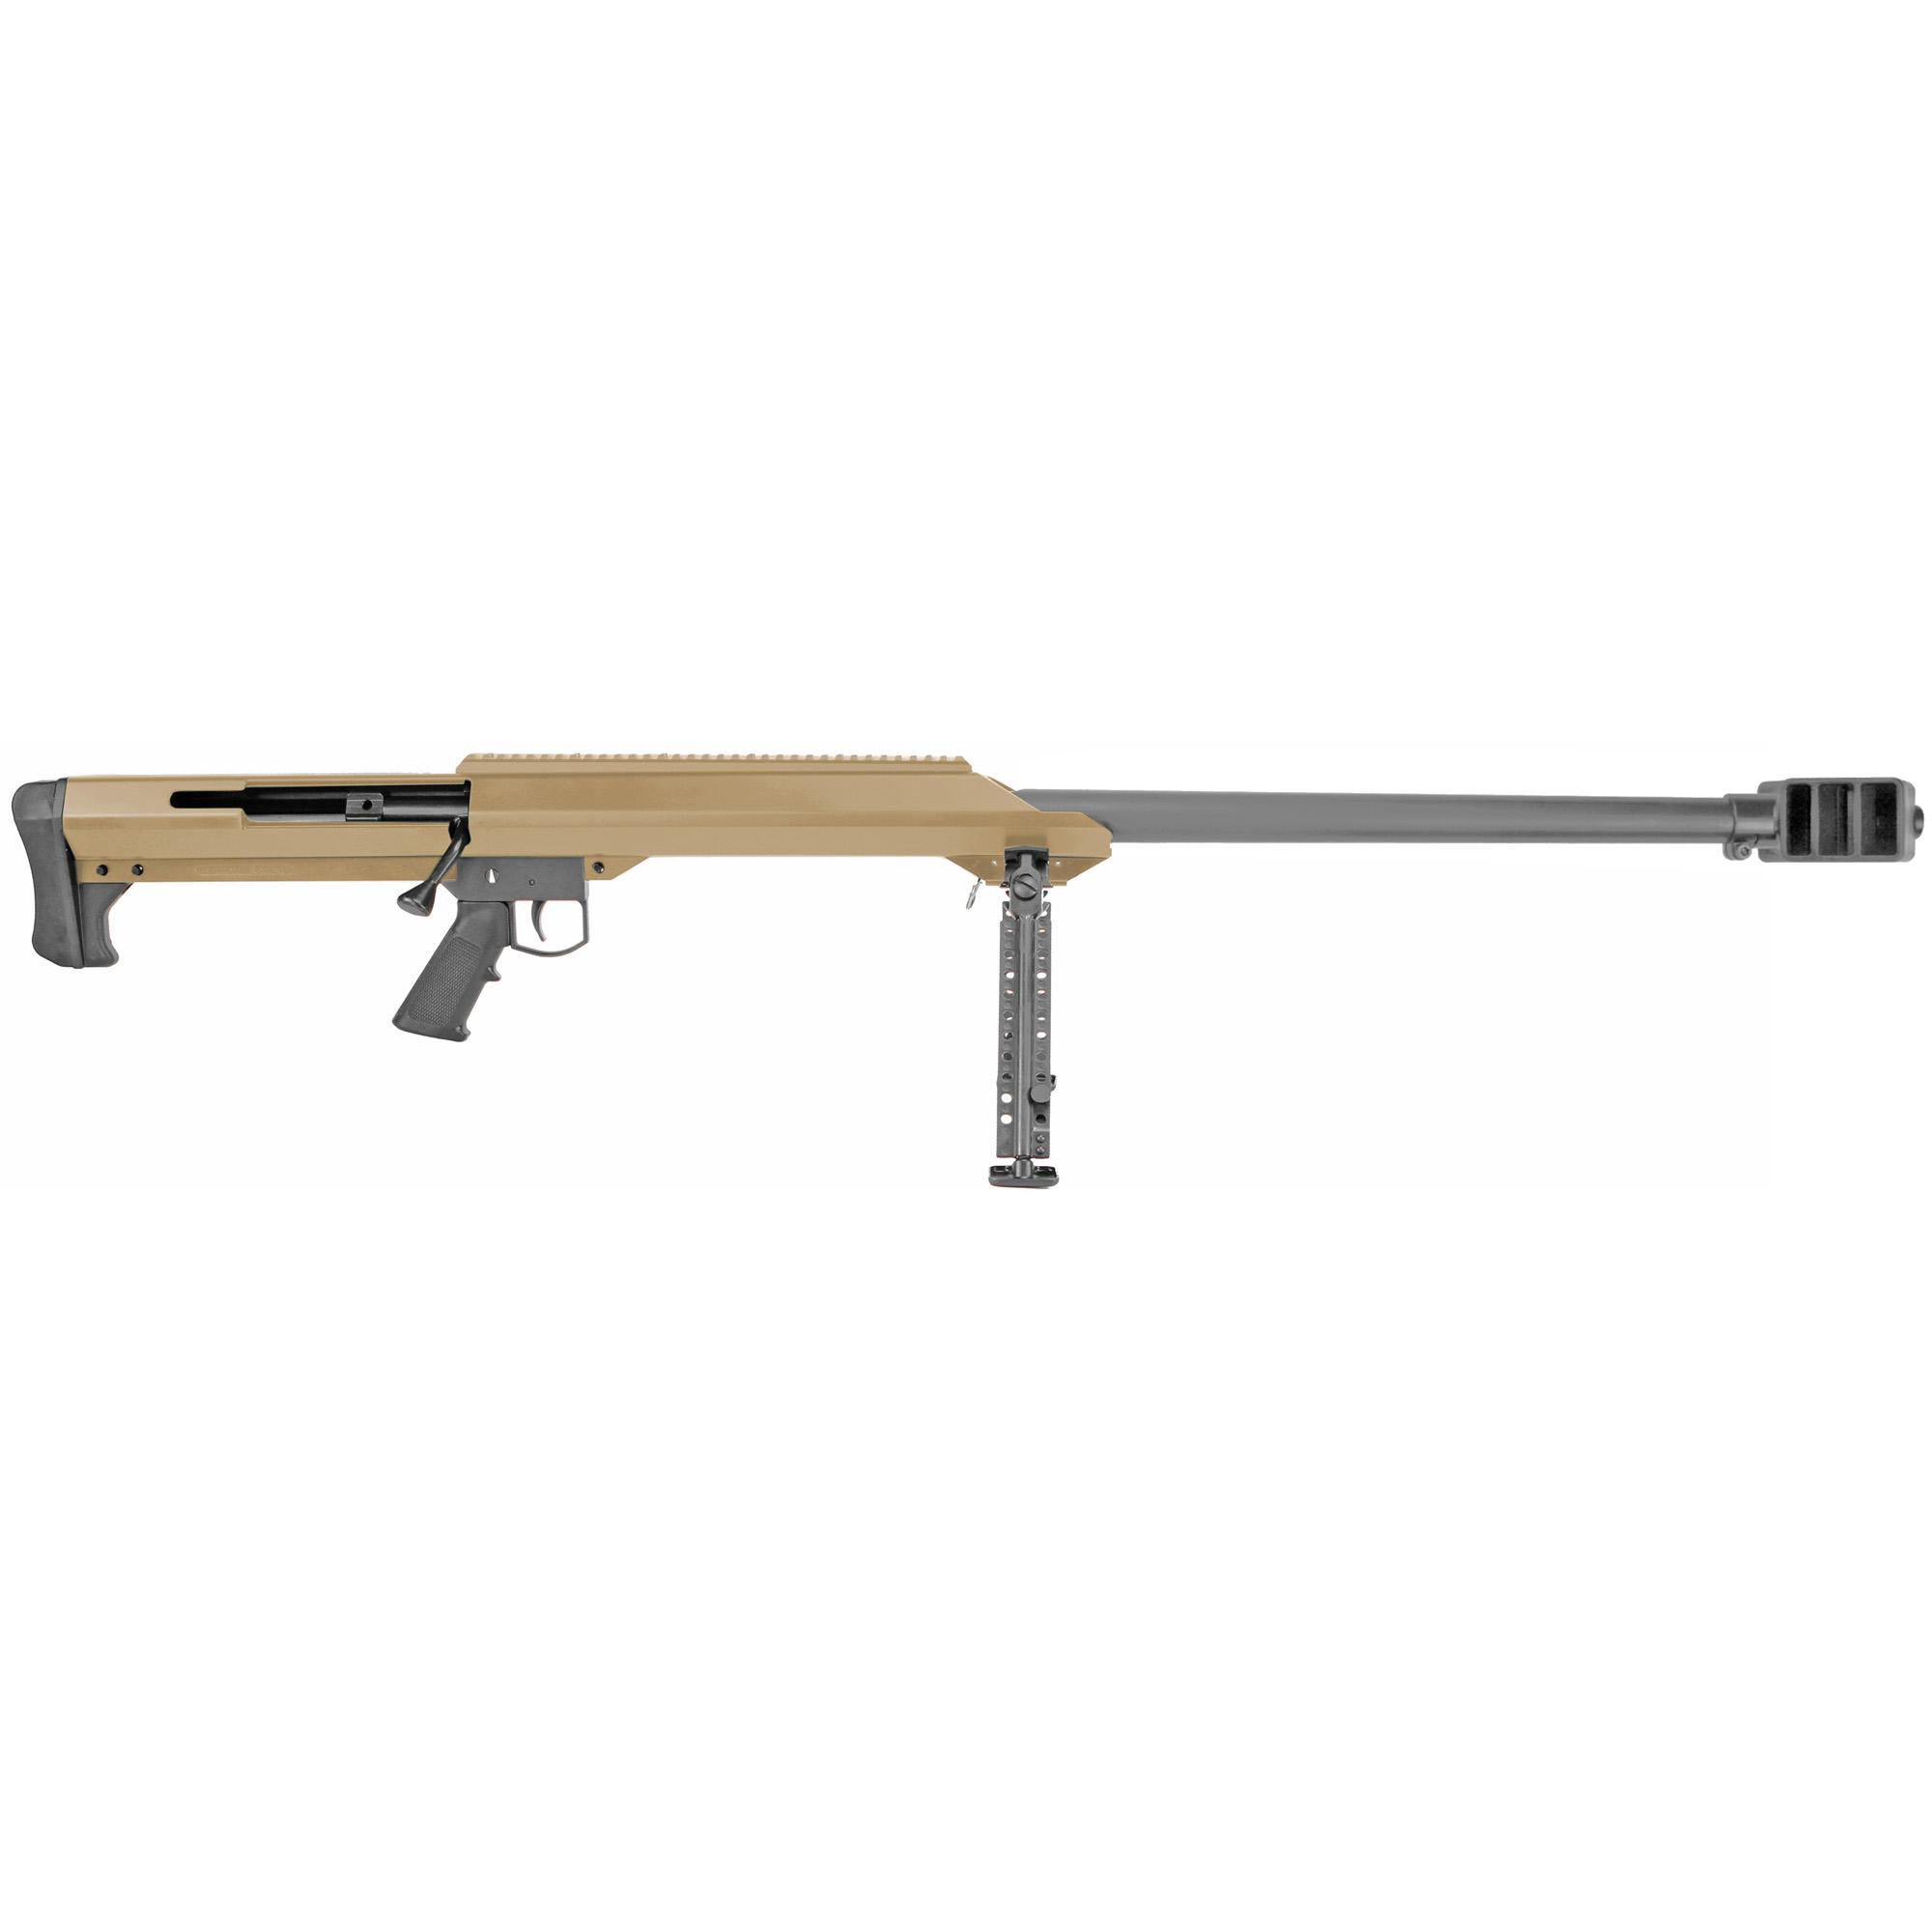 "Barrett 99a1 416 32"" Fde"